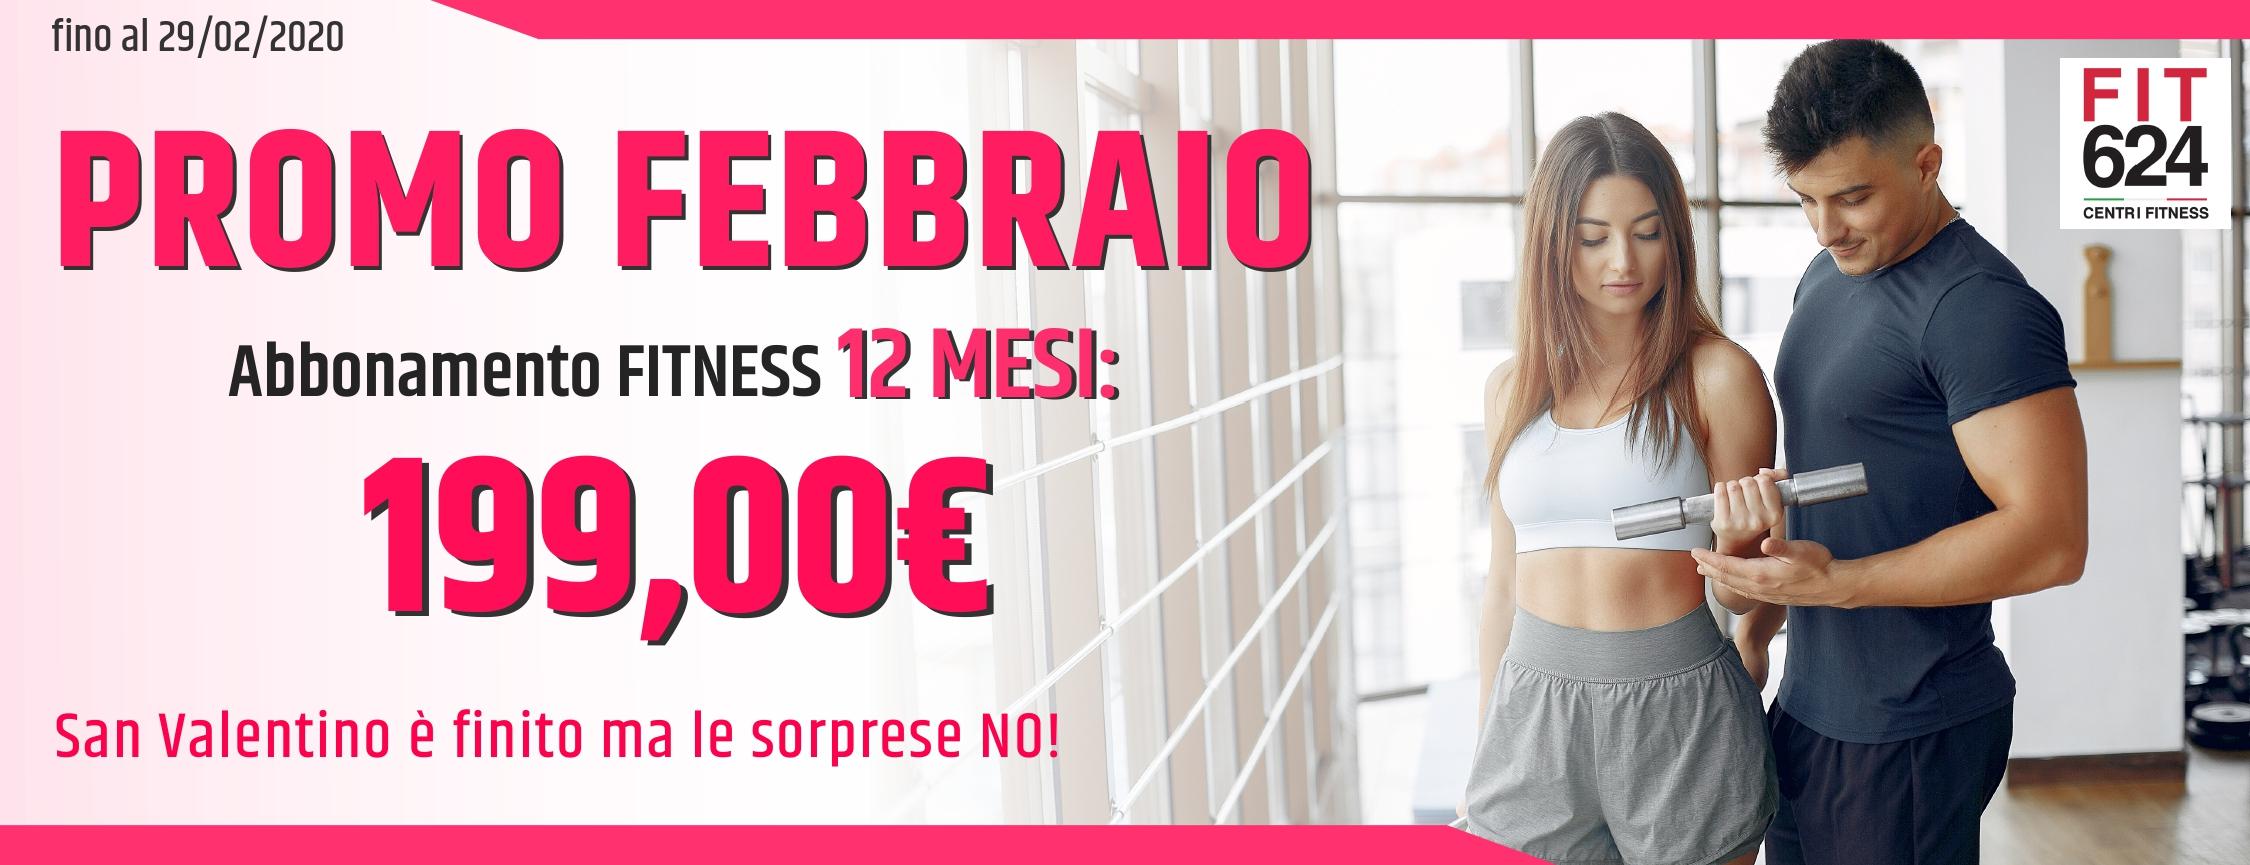 FIT624 Bergamo Promo Febbraio 2020 Prima